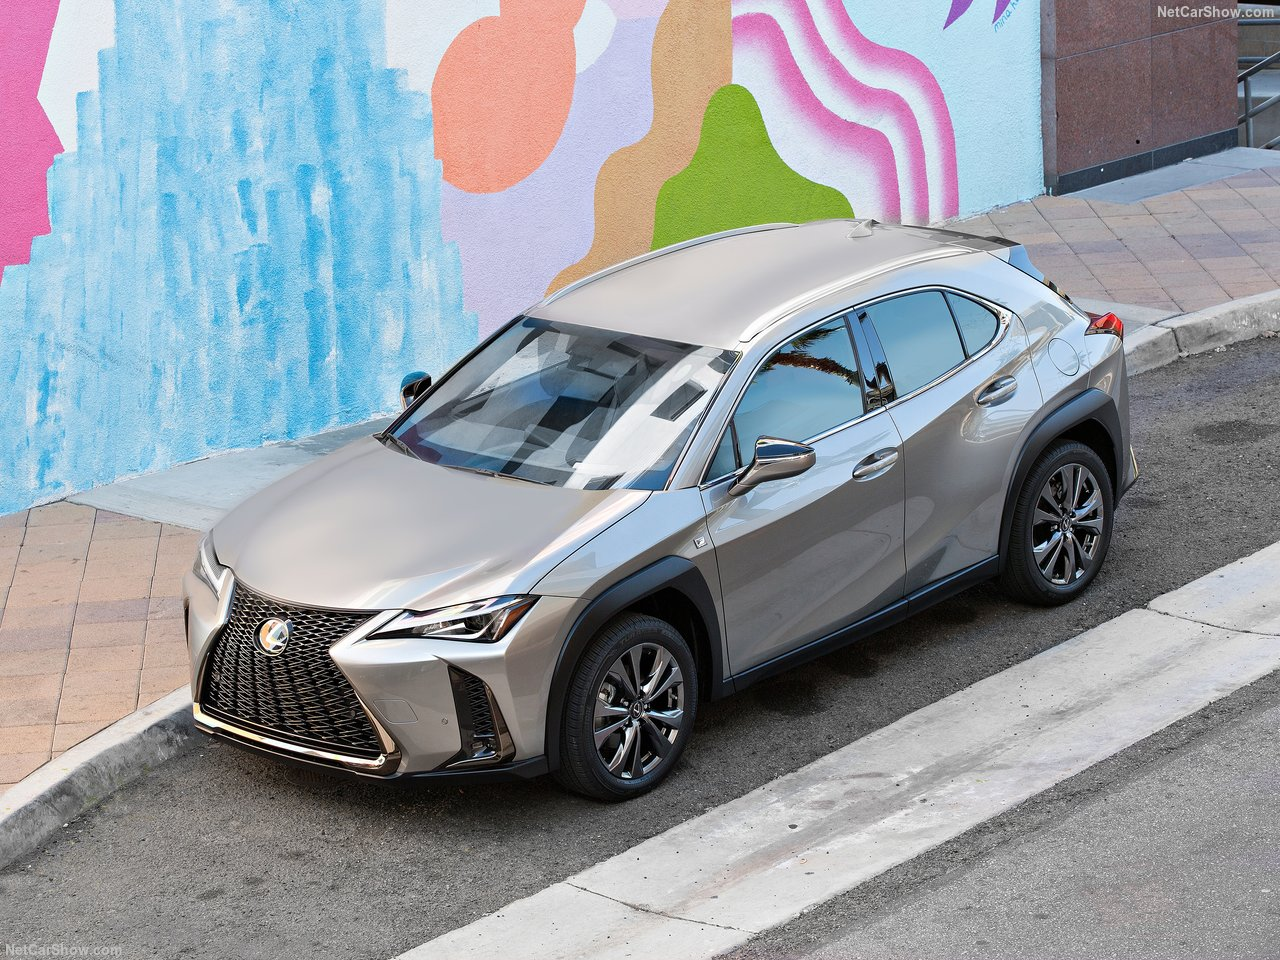 Lexus-UX-2019-1280-02_201808111144243b7.jpg